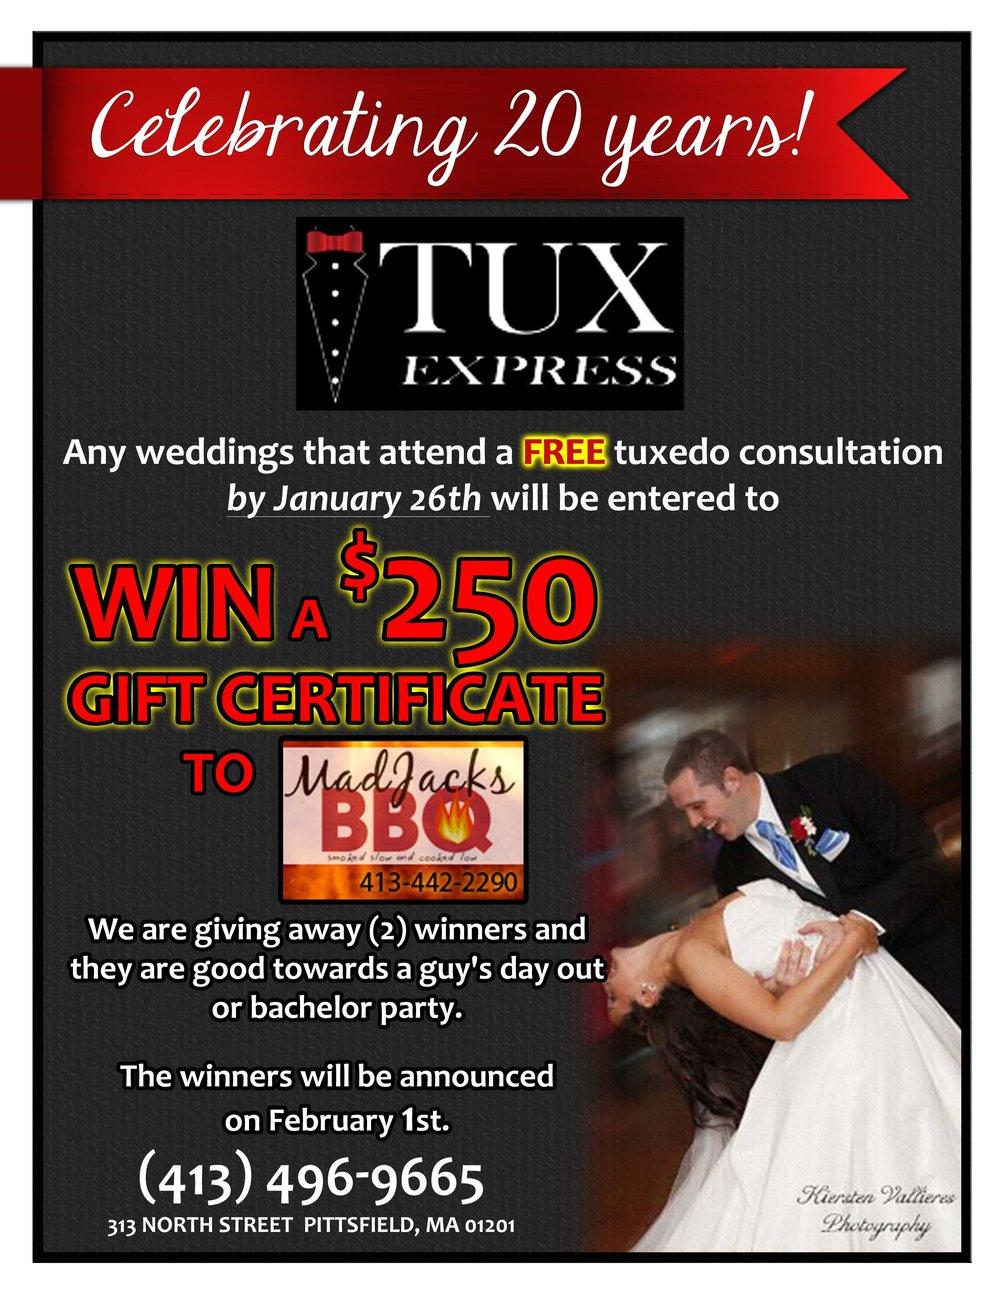 Tux Express 2013 Ad.jpg